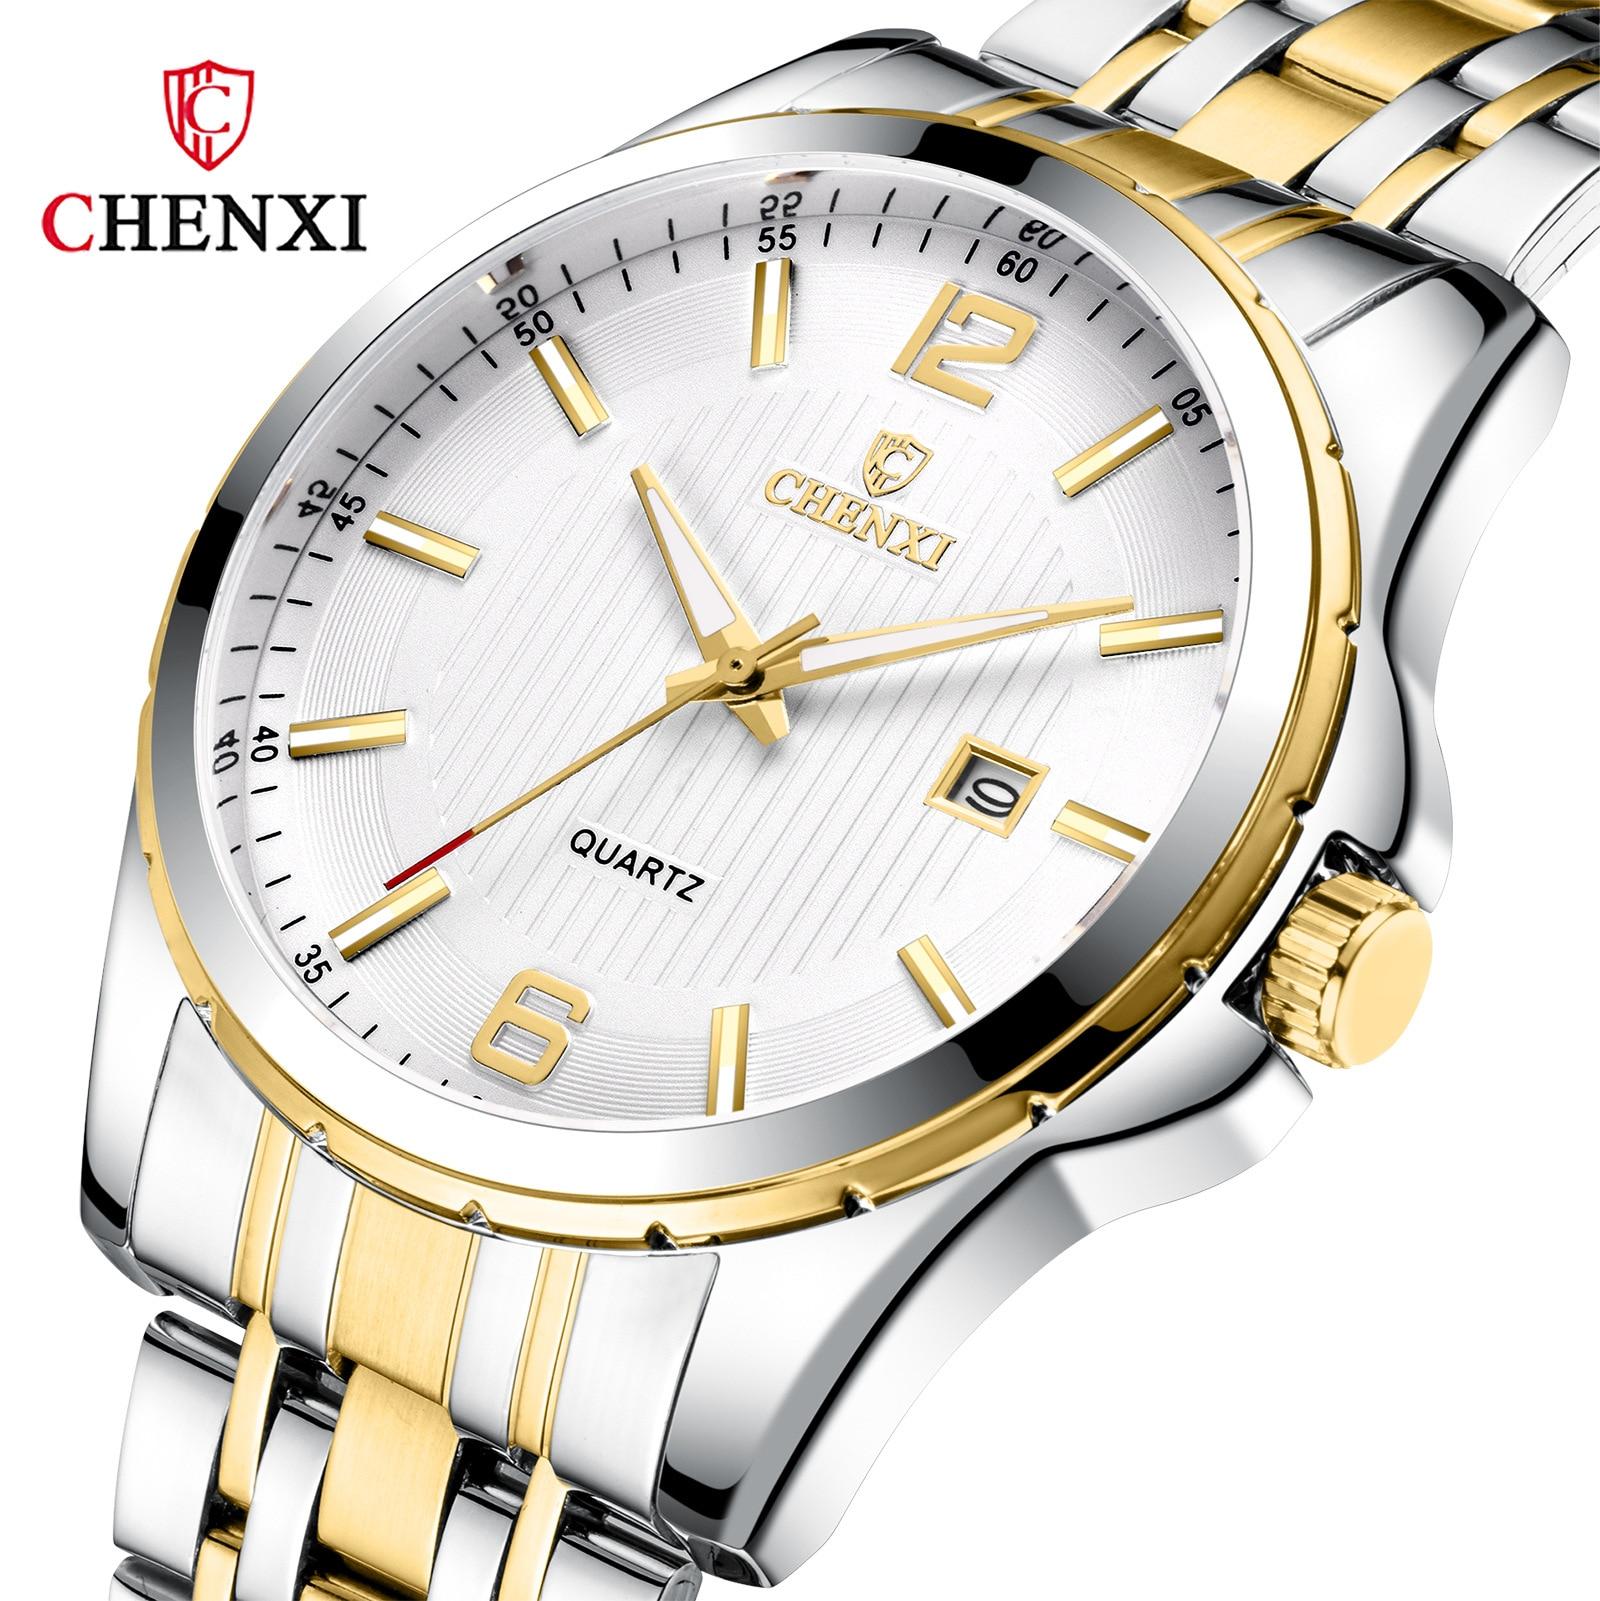 Moda chenxi marca superior relógios de luxo masculino quartzo analógico militar masculino dourado relógio de pulso à prova dwaterproof água relogio masculino